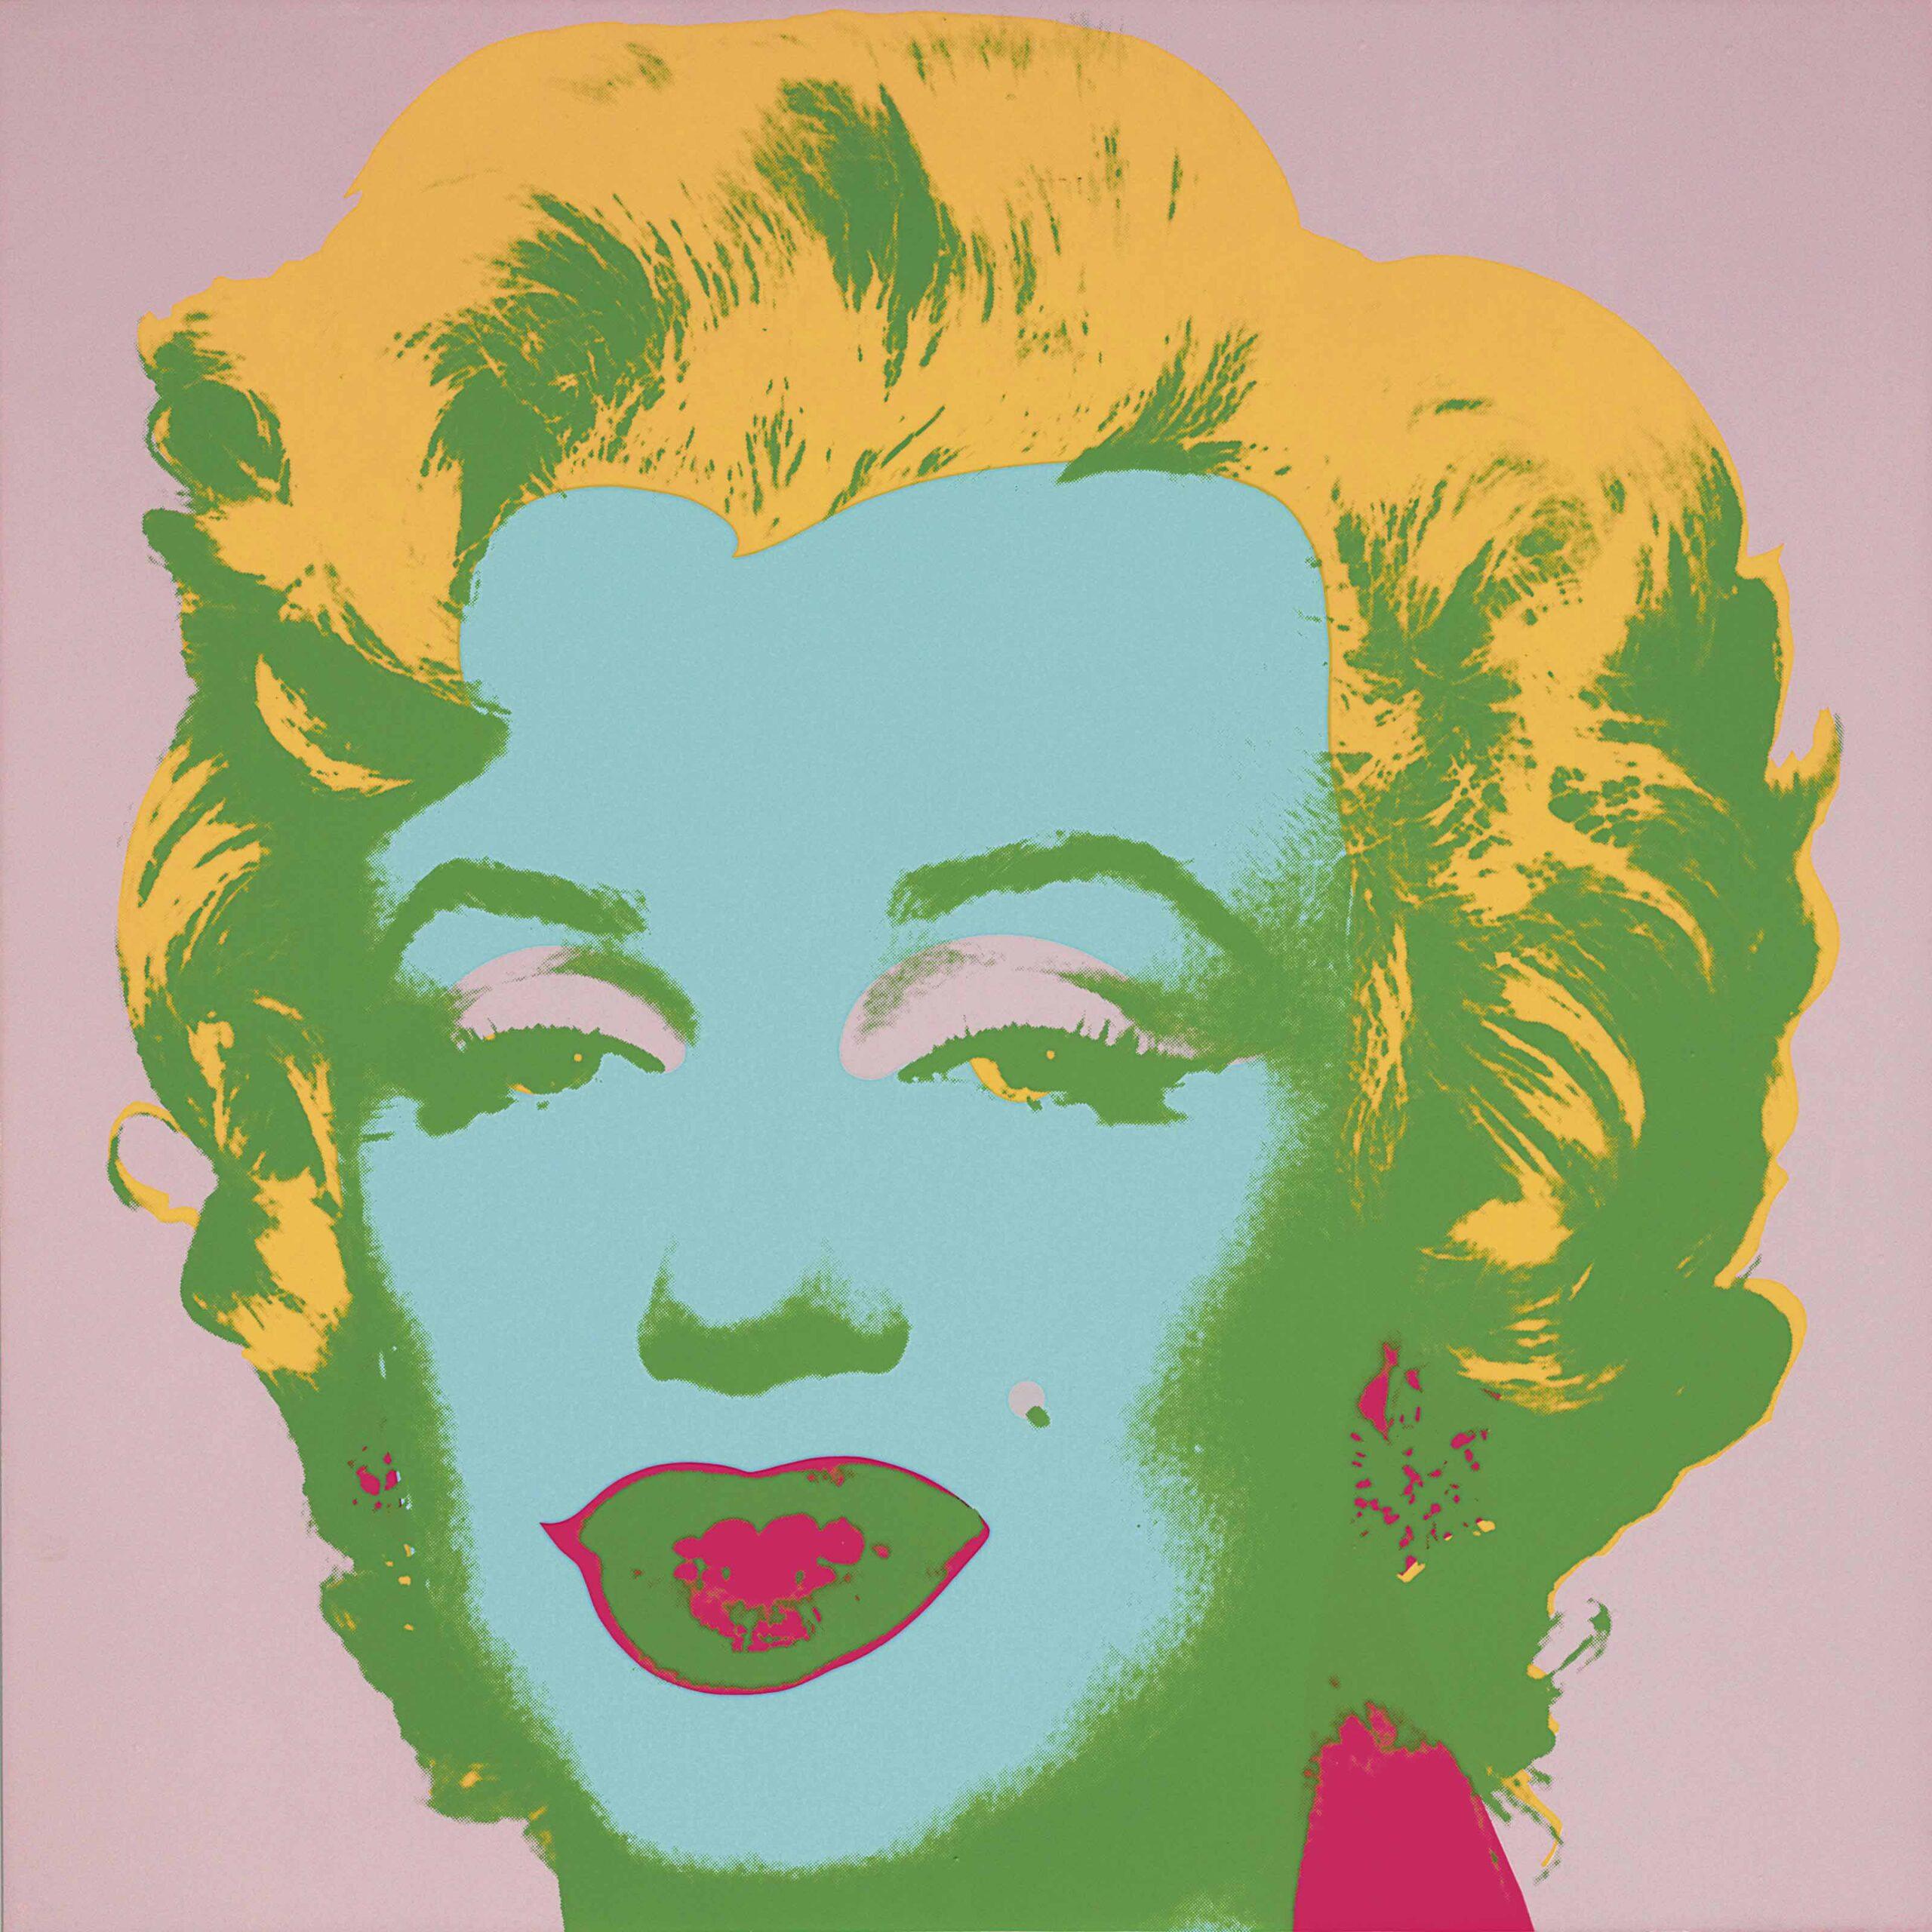 Andy Warhol Marilyn Monroe 28 (Wanted) - ARTPLEASE